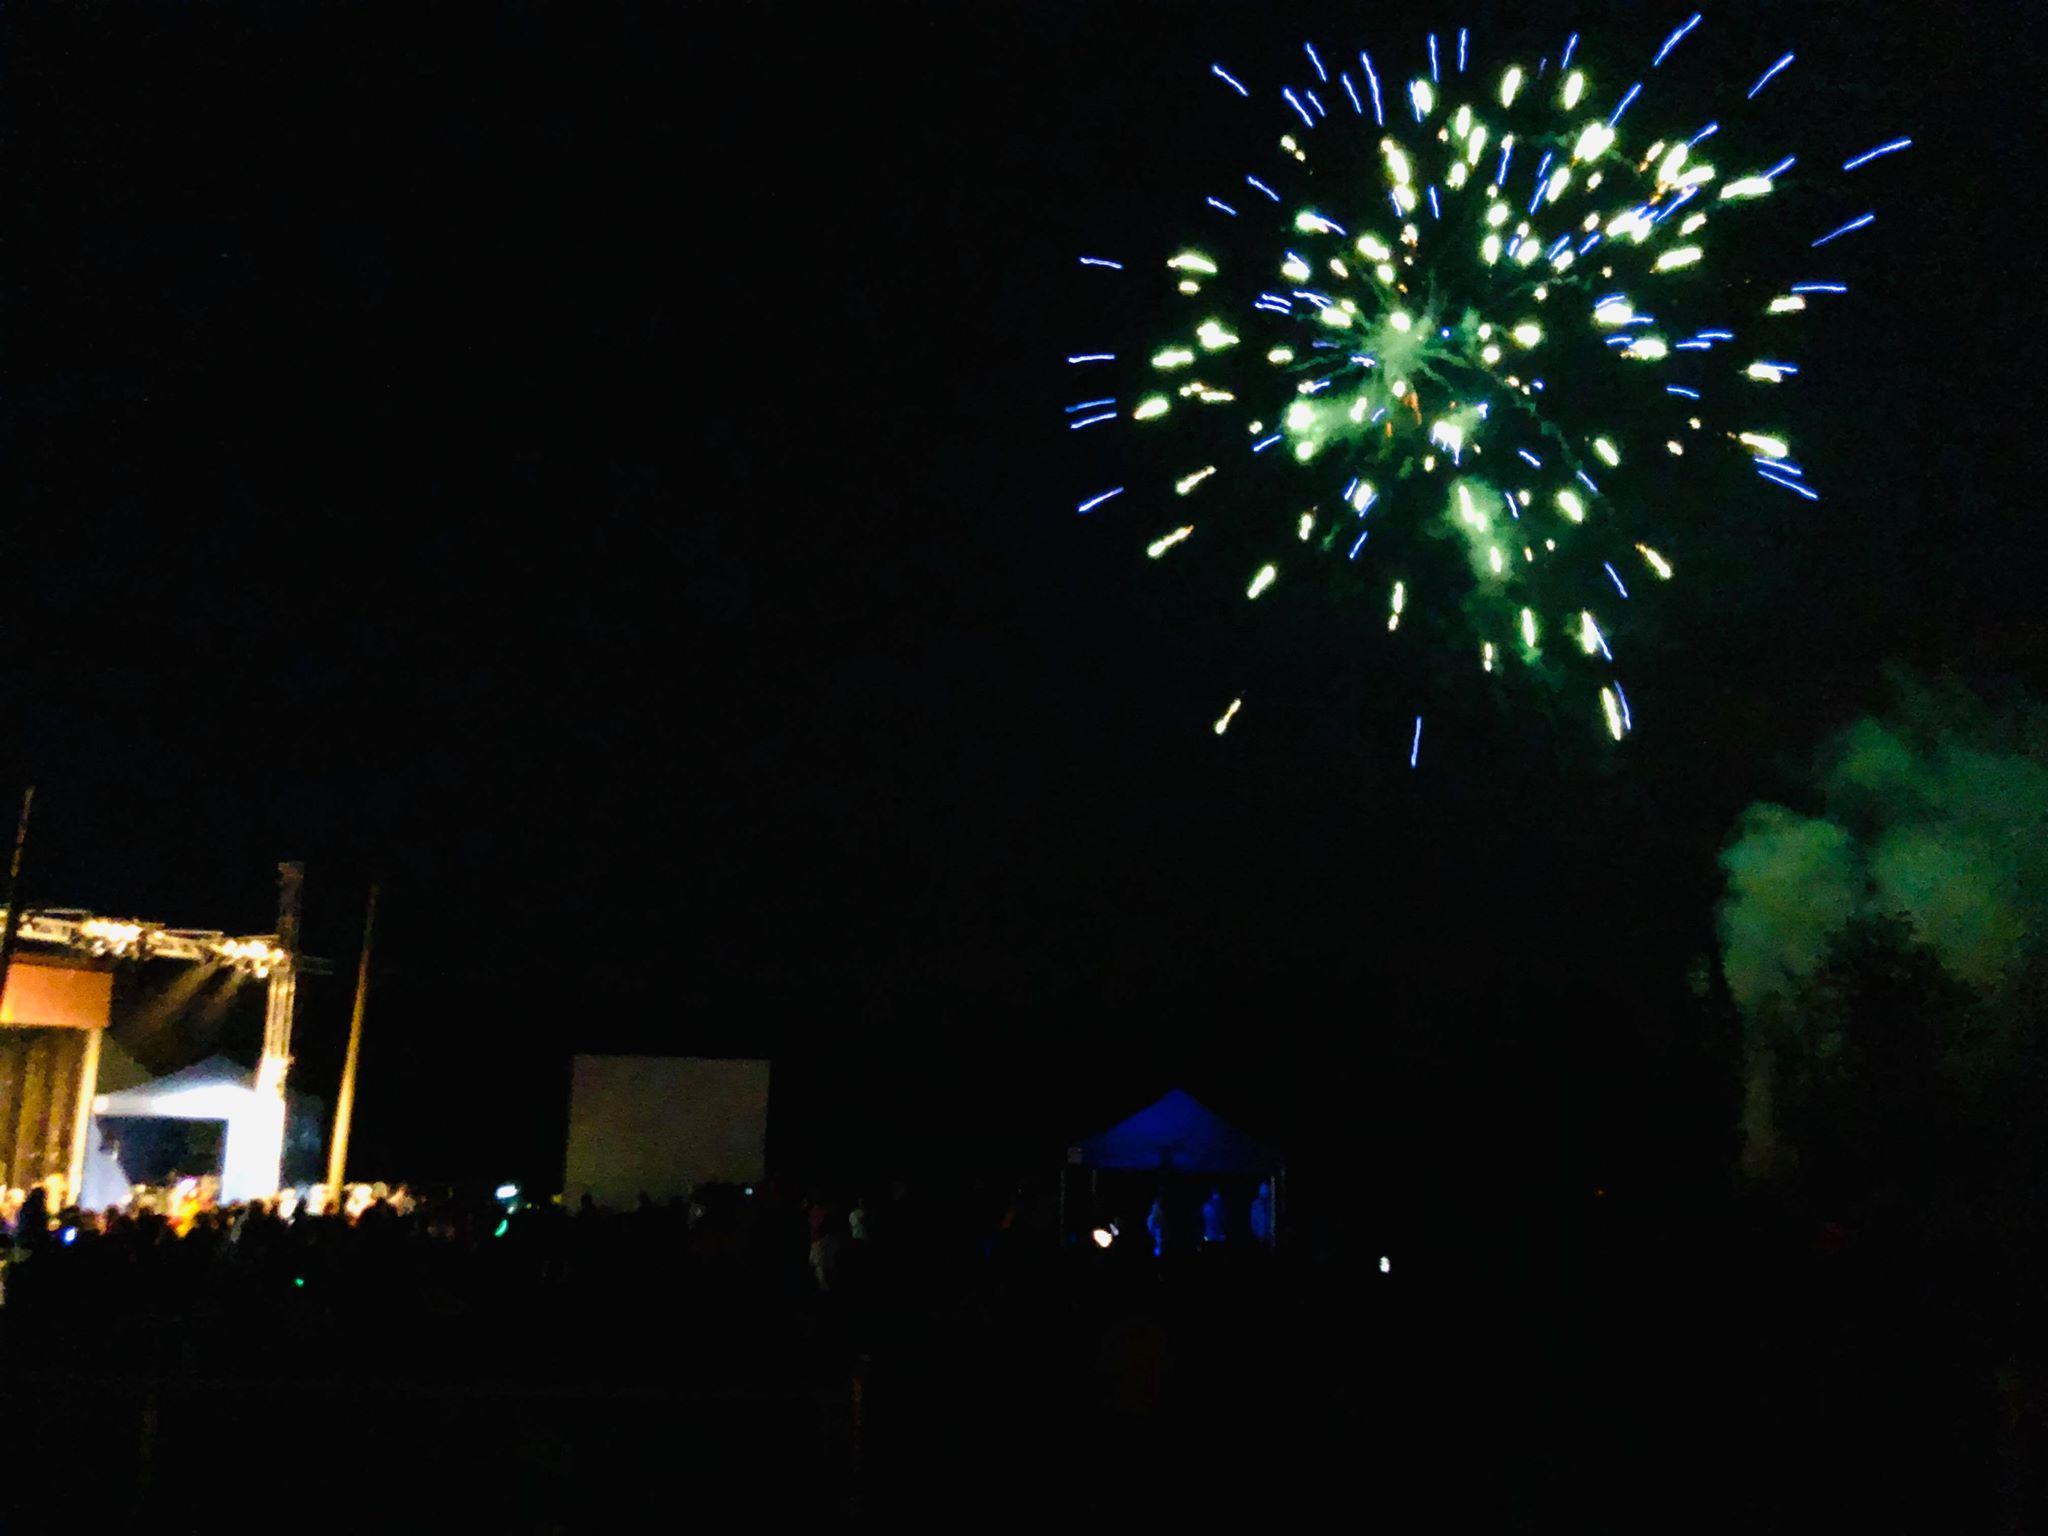 http://www.campingatlantide.com/wp-content/uploads/2019/07/all-acces-showband-complexe-atlantide-5.jpg